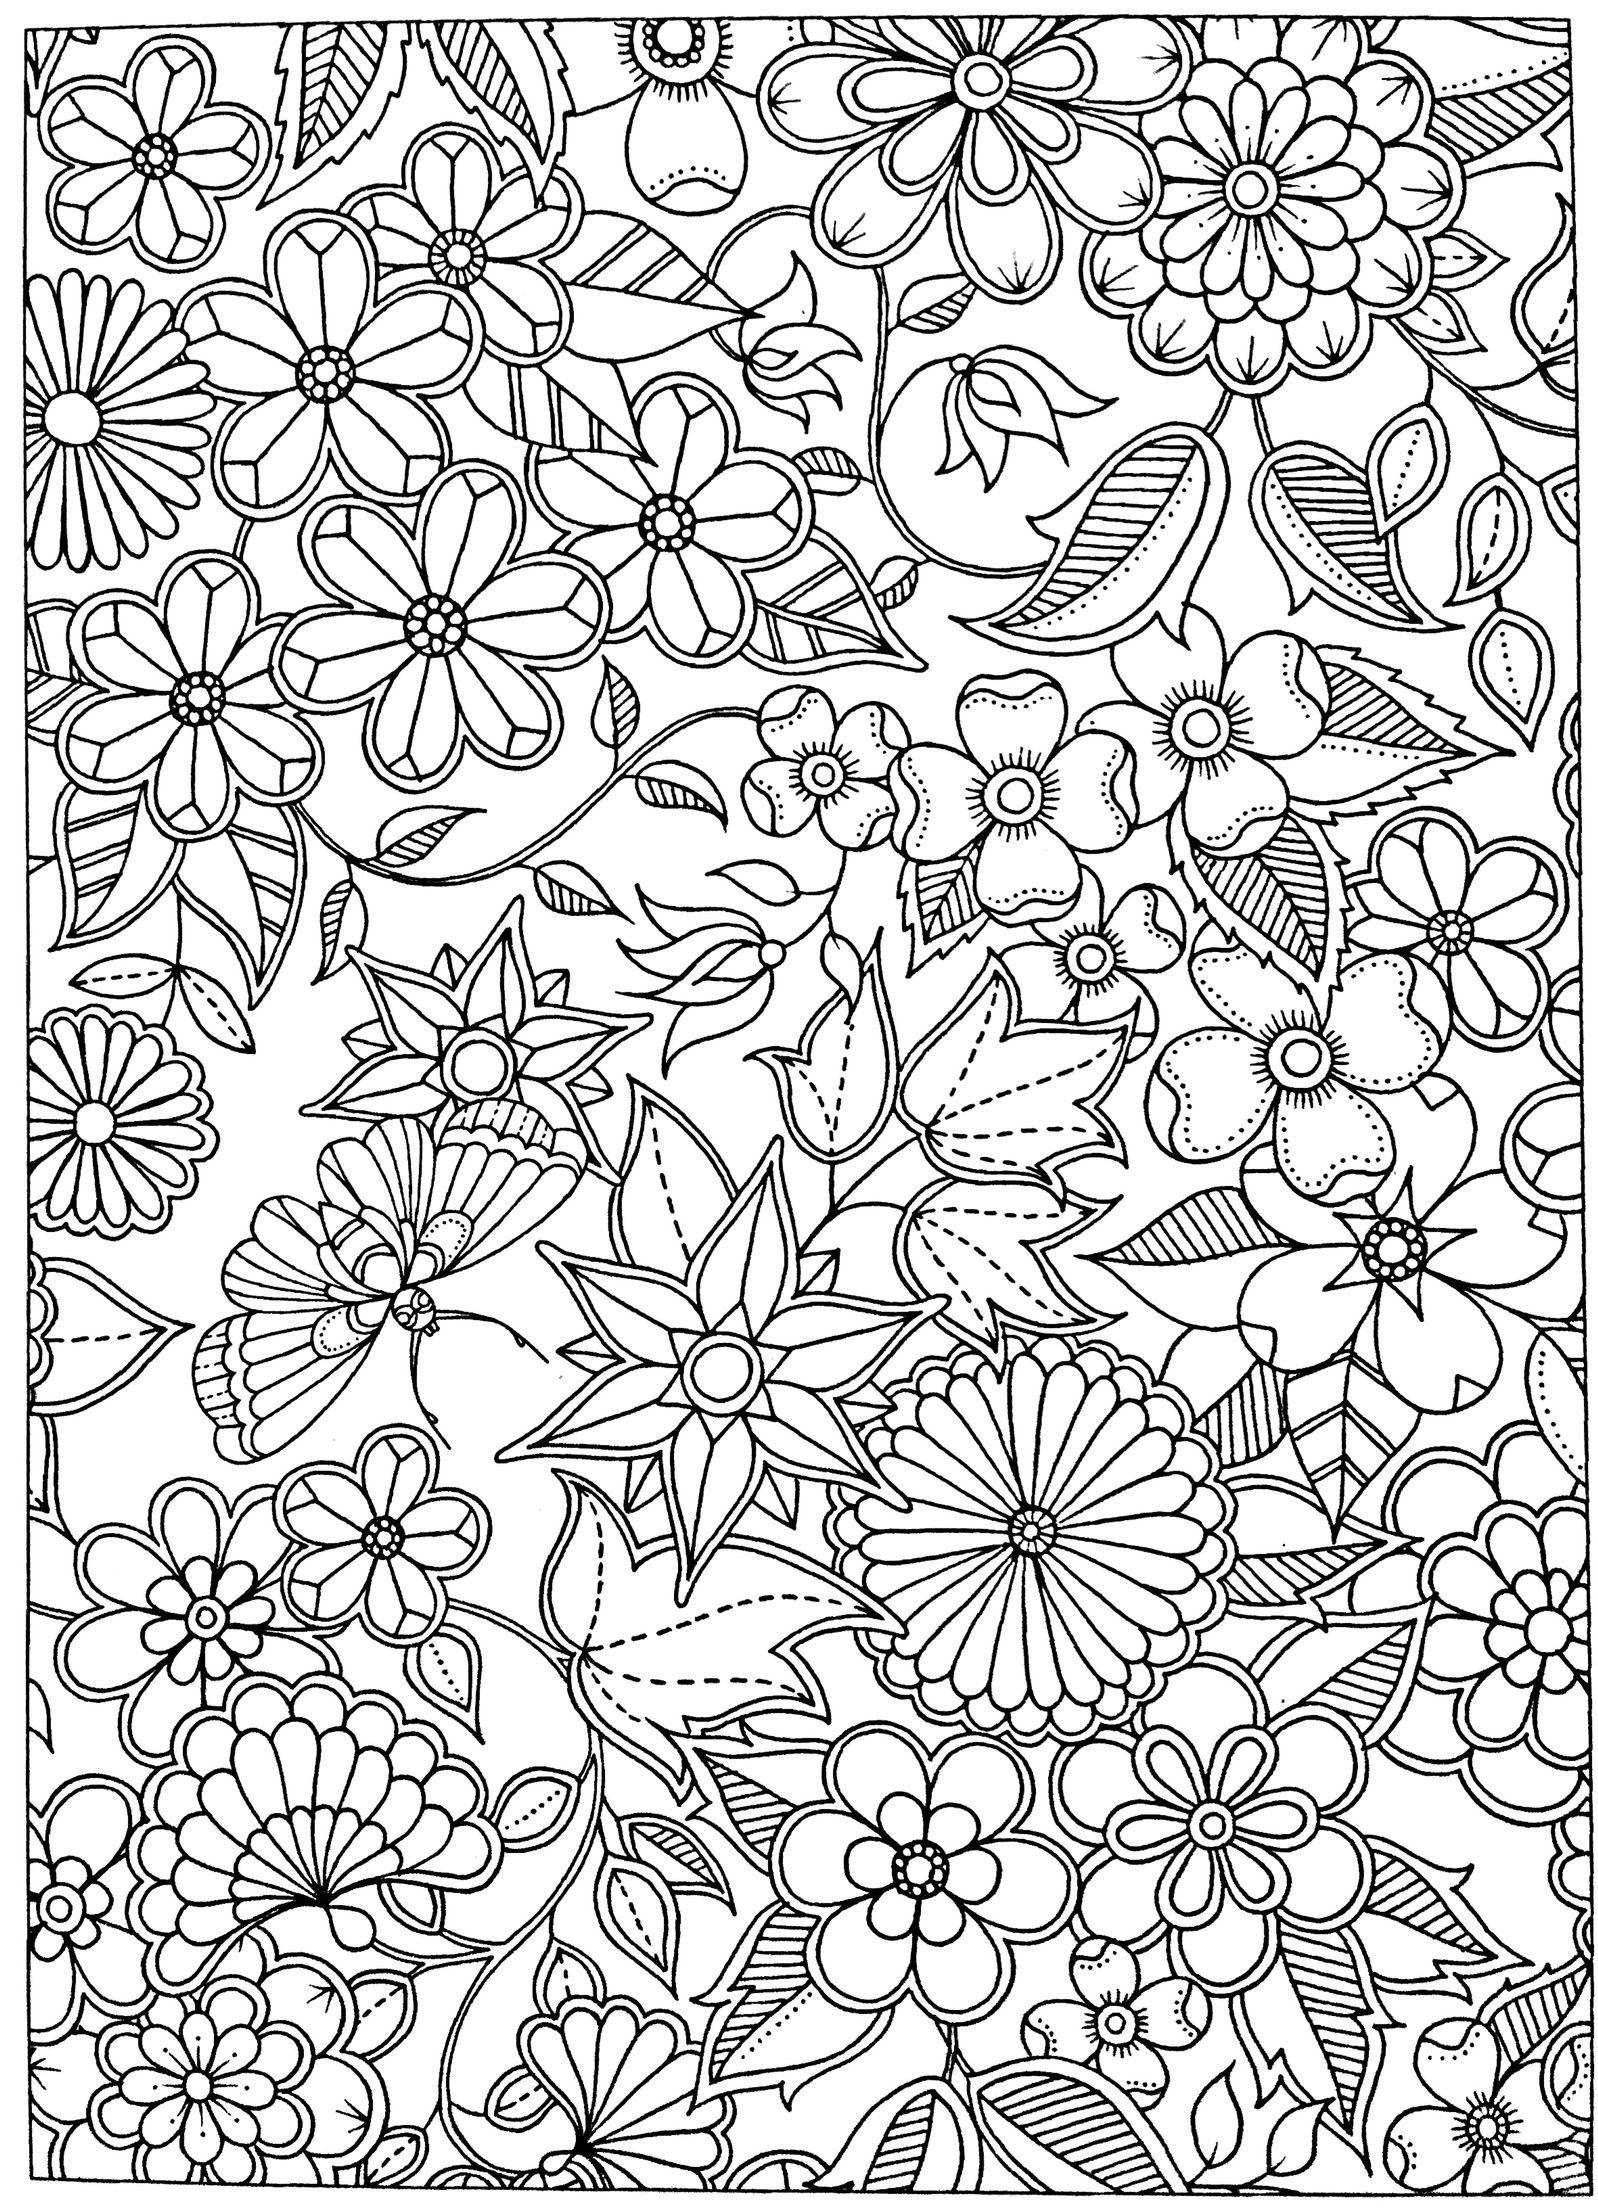 Free Adult Coloring Page Secret Garden